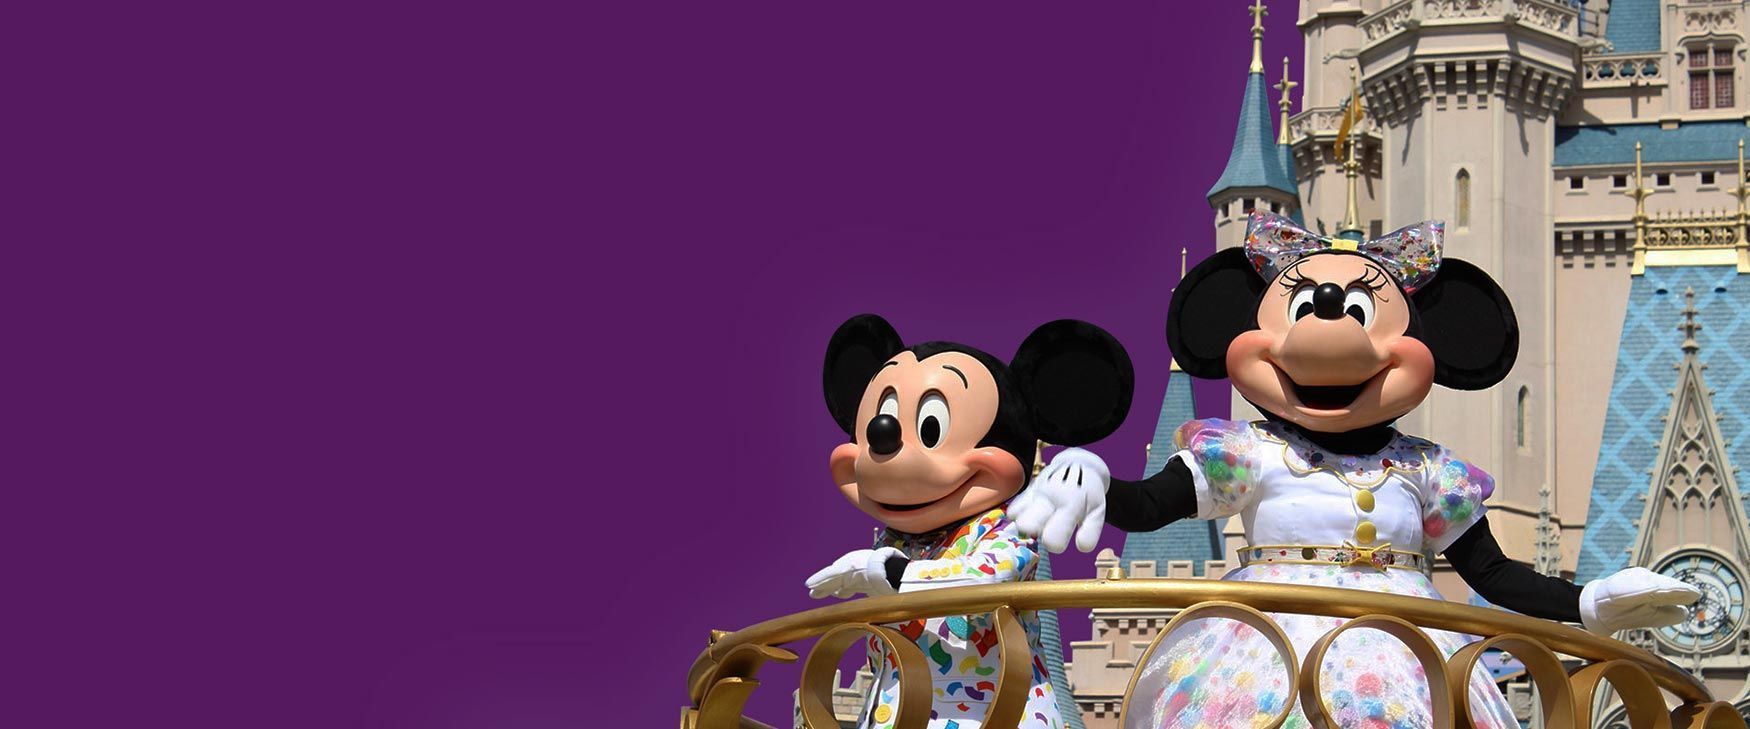 DisneyStore_Roermond